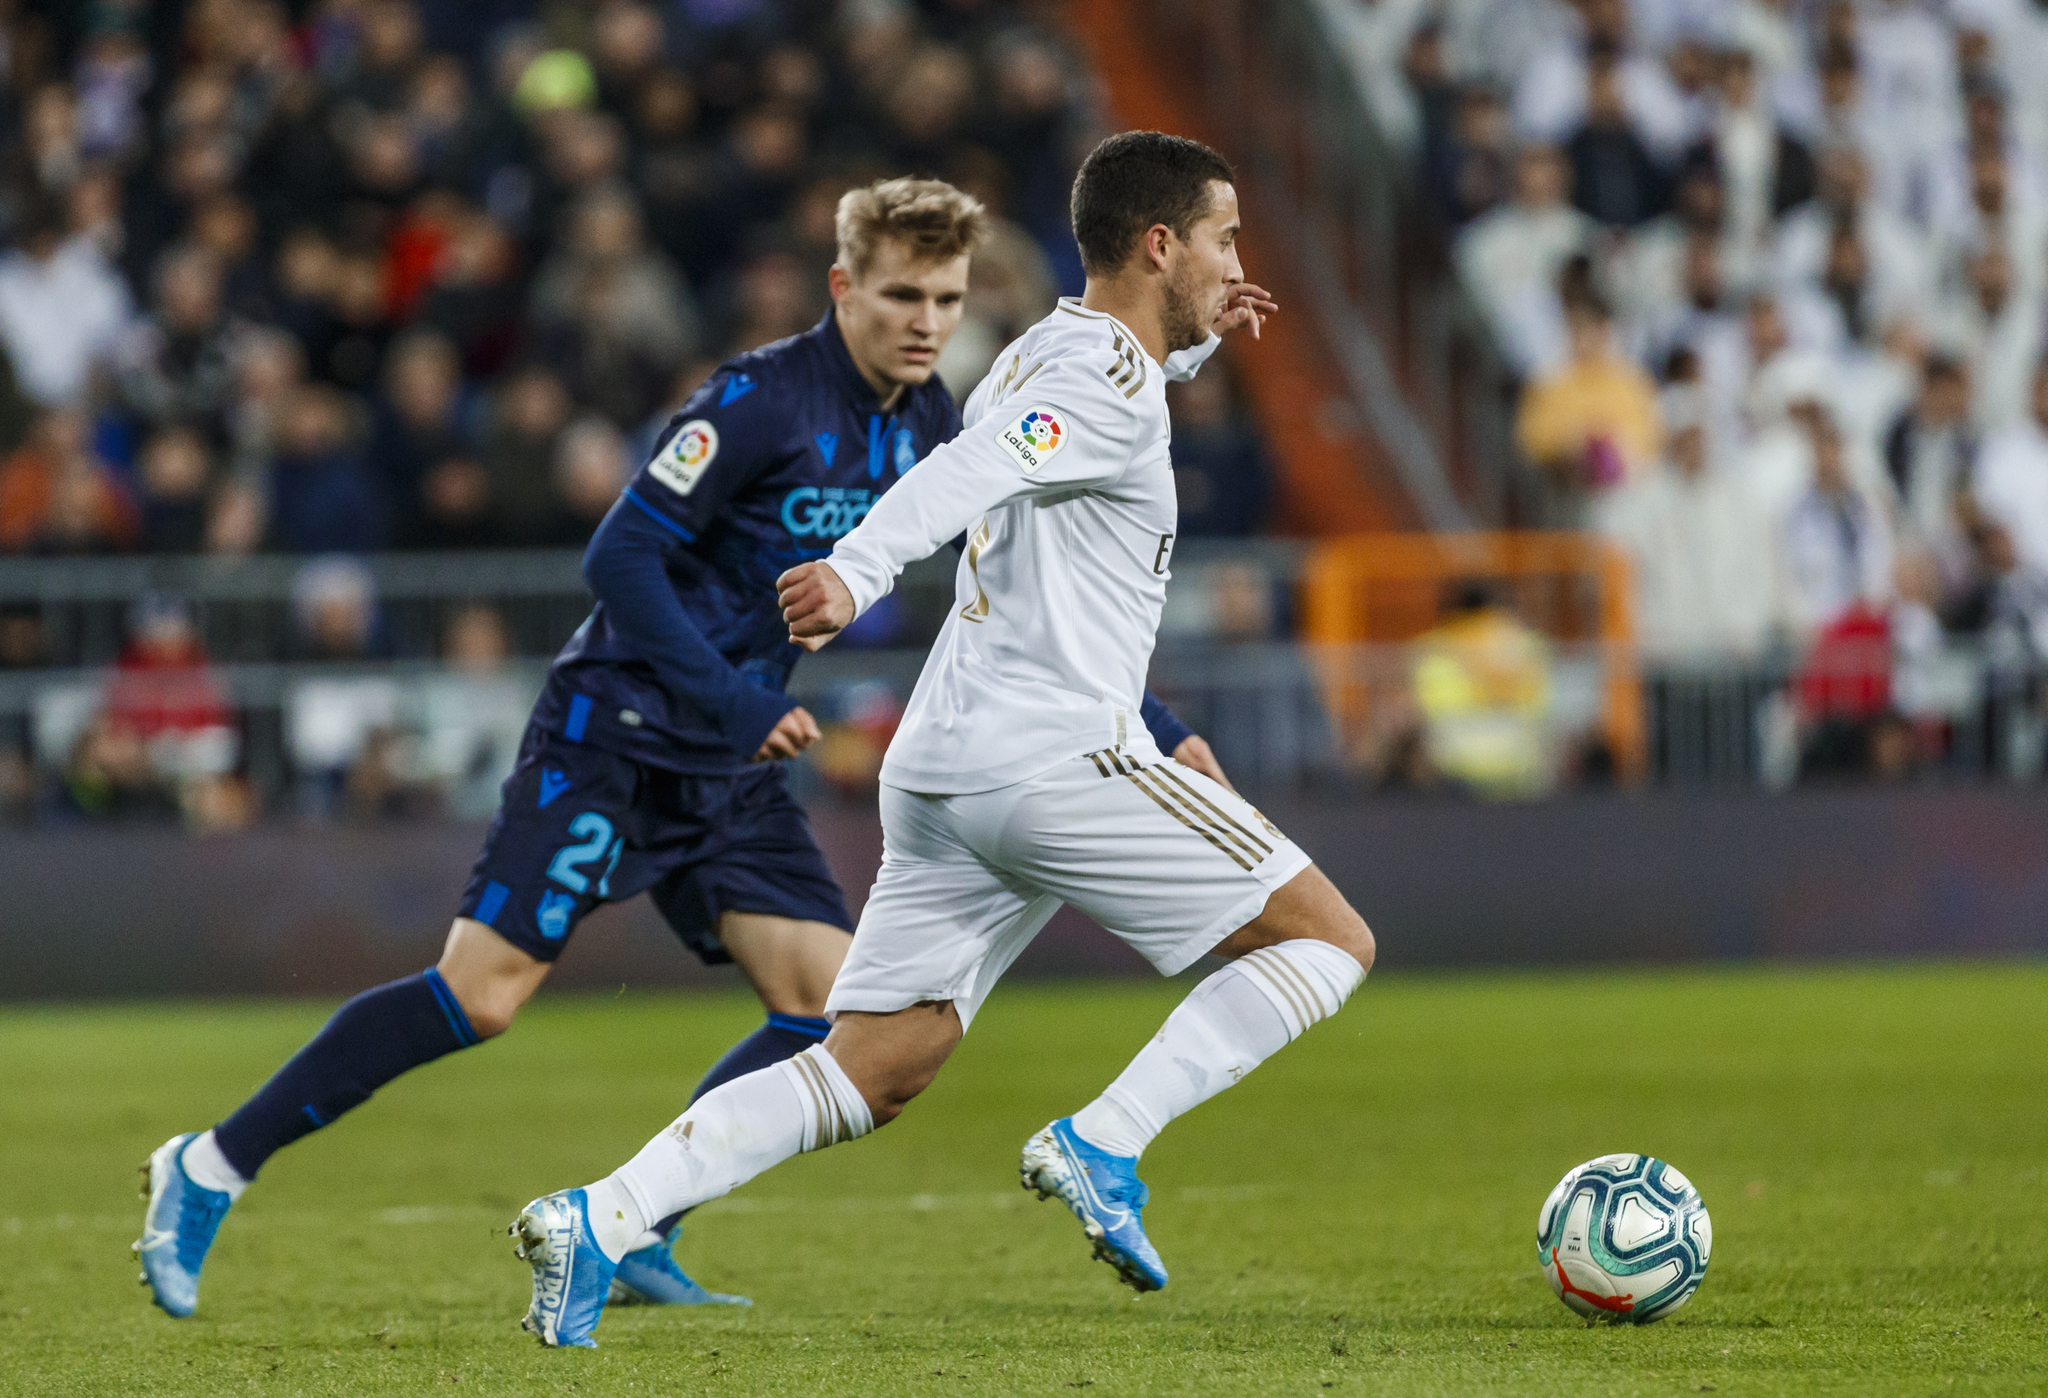 Hazard speaks on scoring more goals than Cristiano Ronaldo at Real Madrid